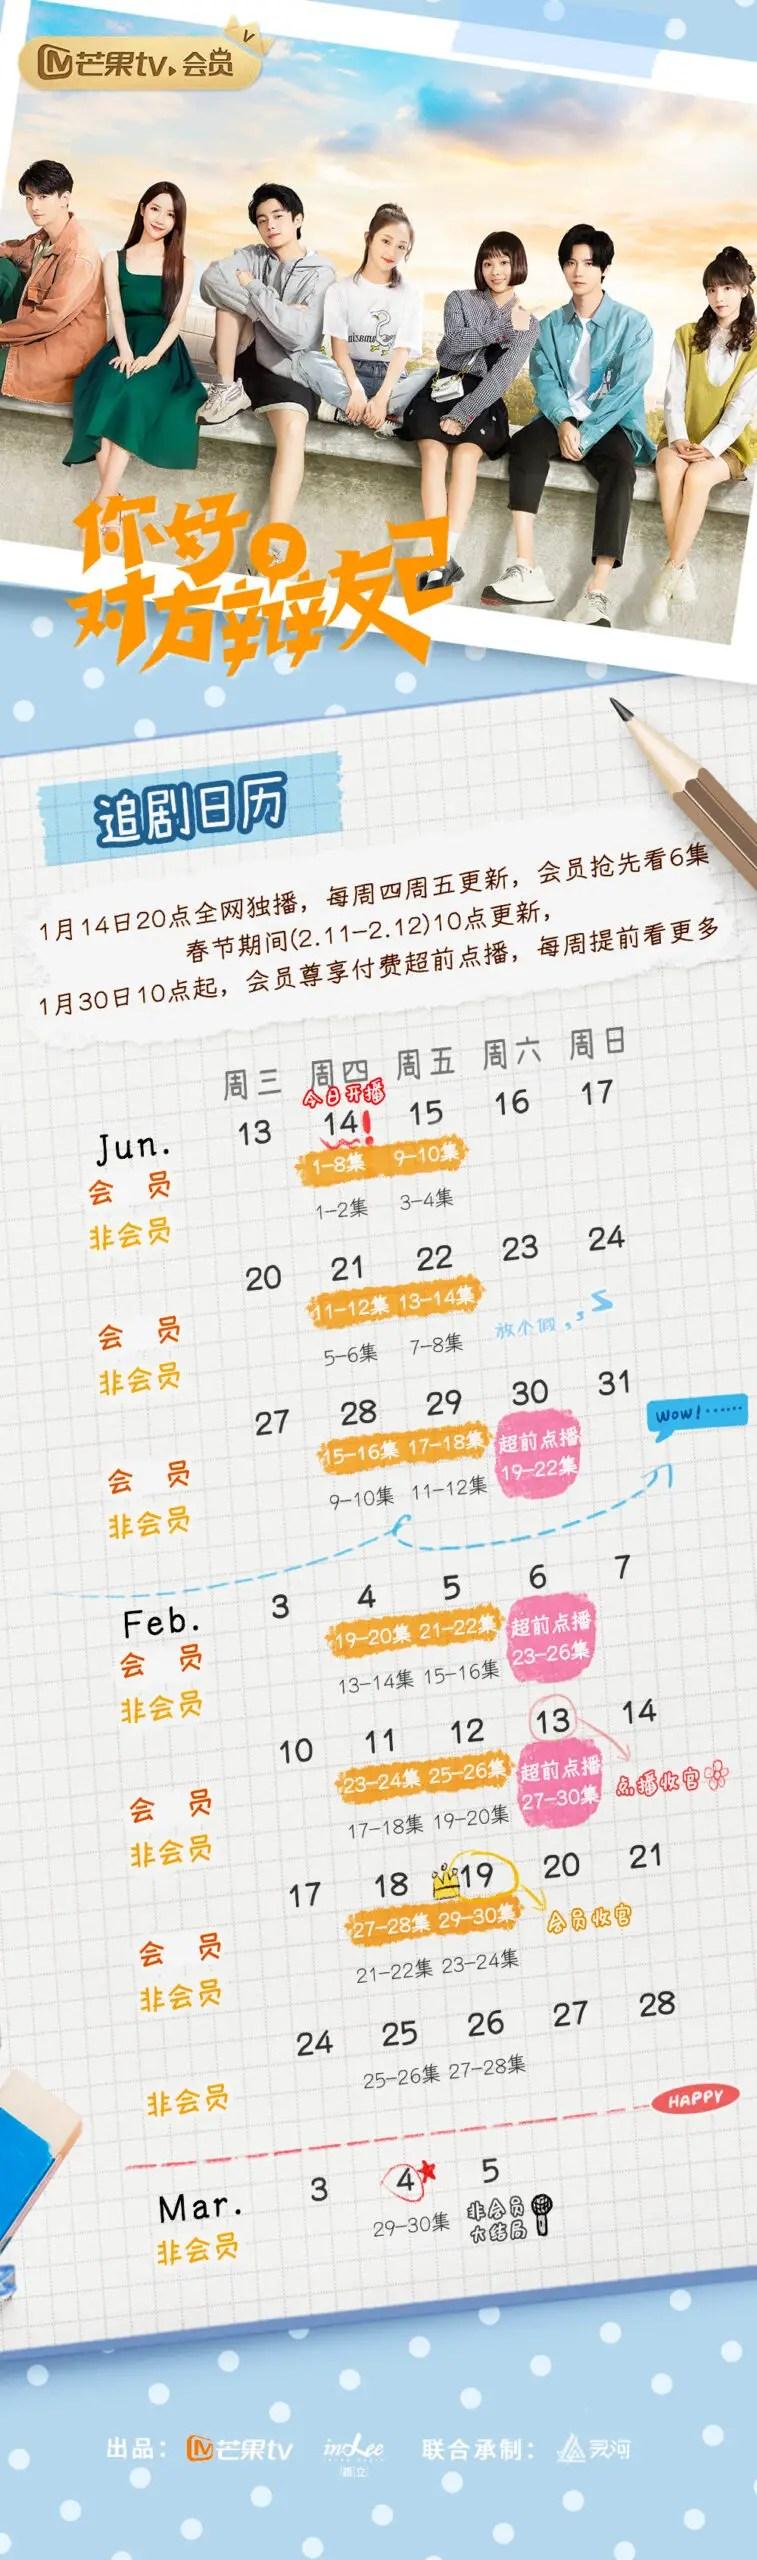 Hello Debate Opponent 2 Chinese Drama Airing Calendar